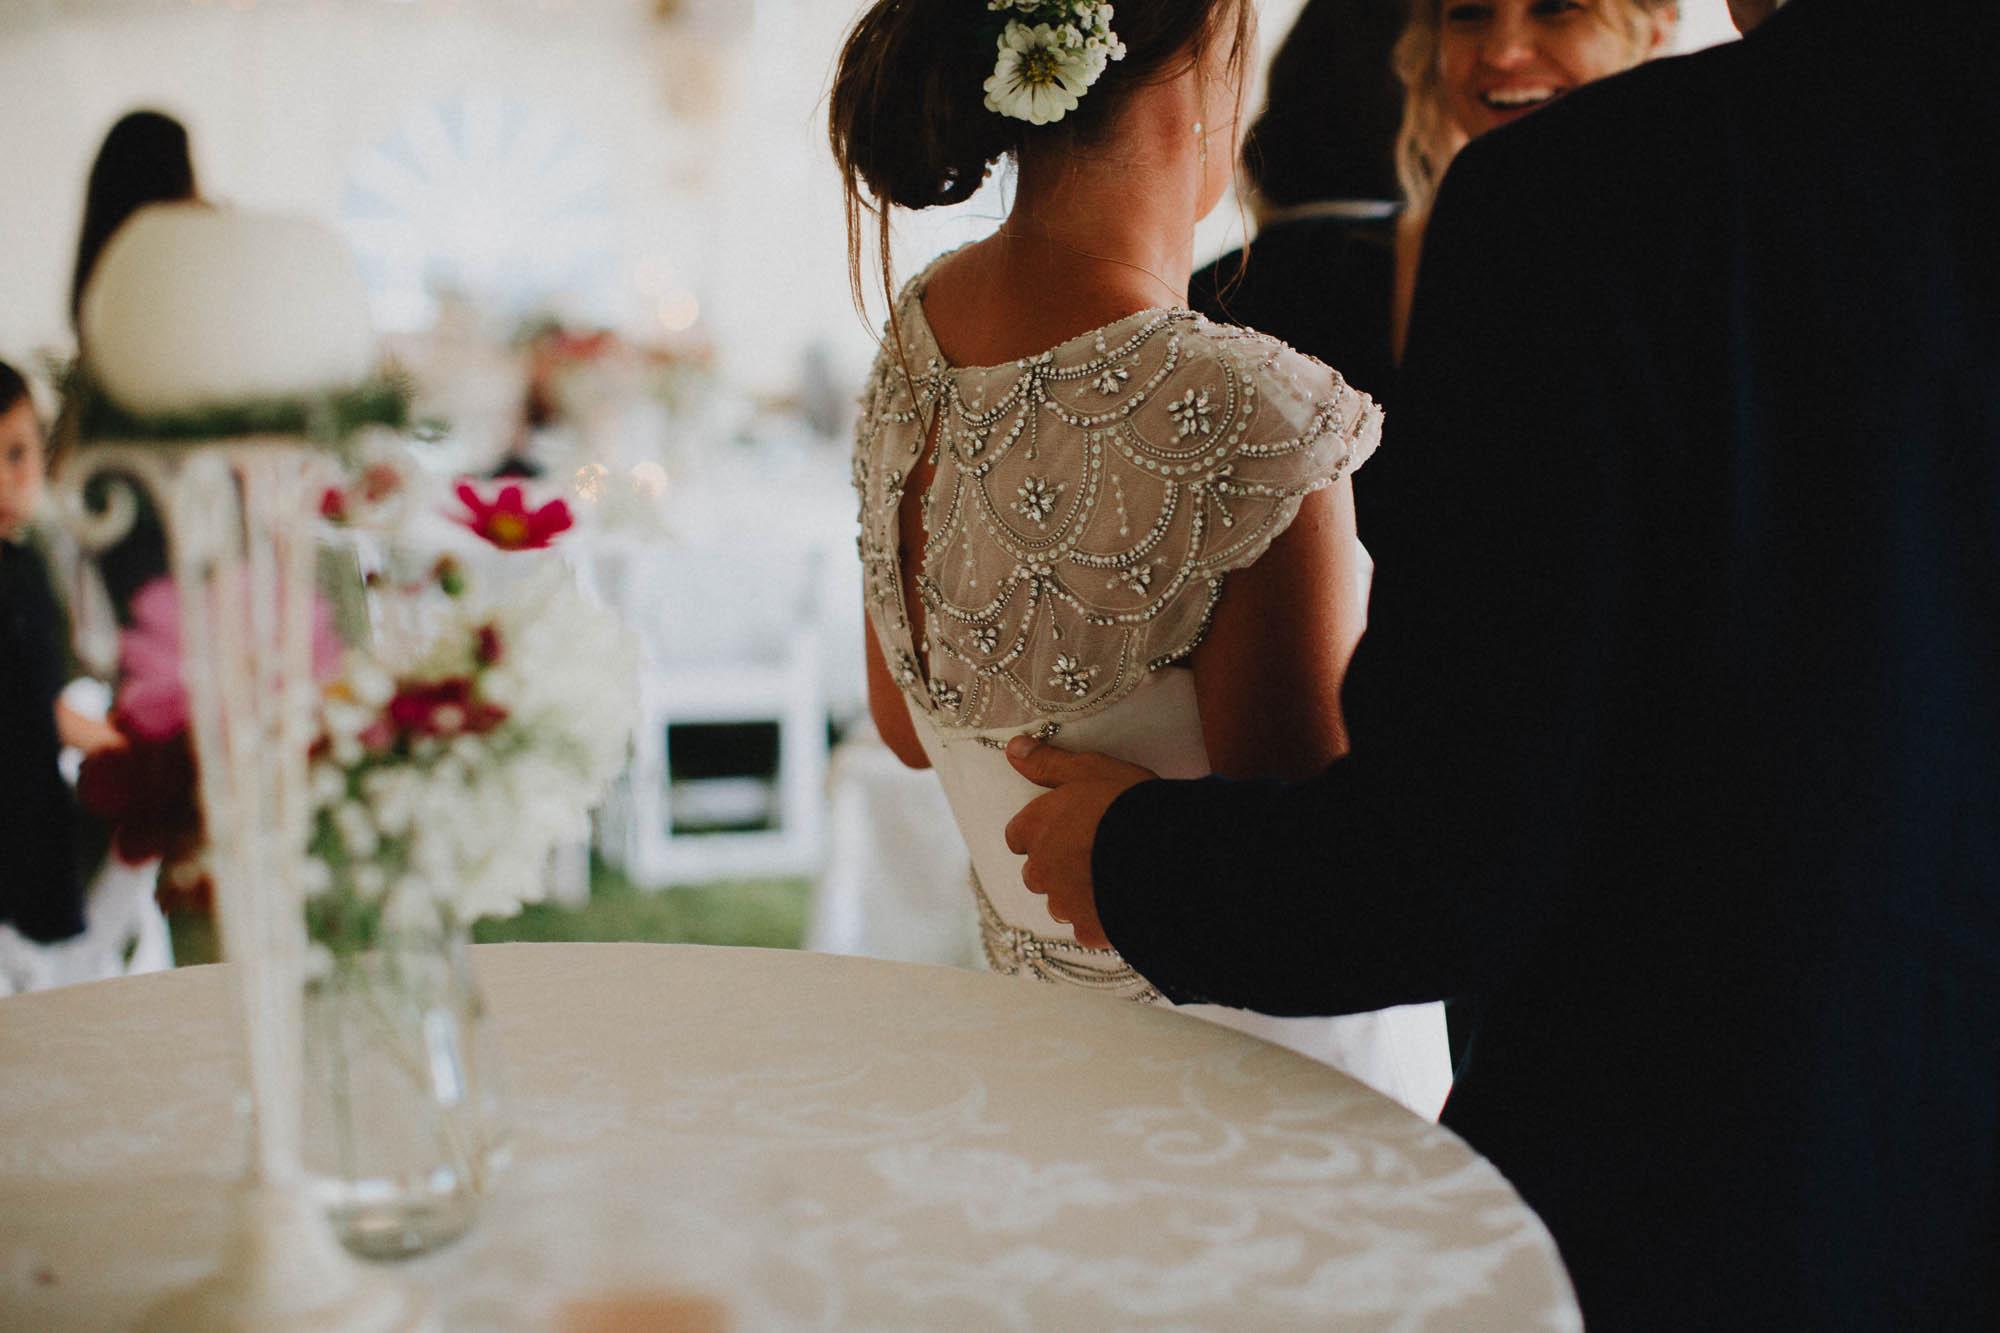 Leah-Graham-Michigan-Outdoor-DIY-Wedding-057@2x.jpg